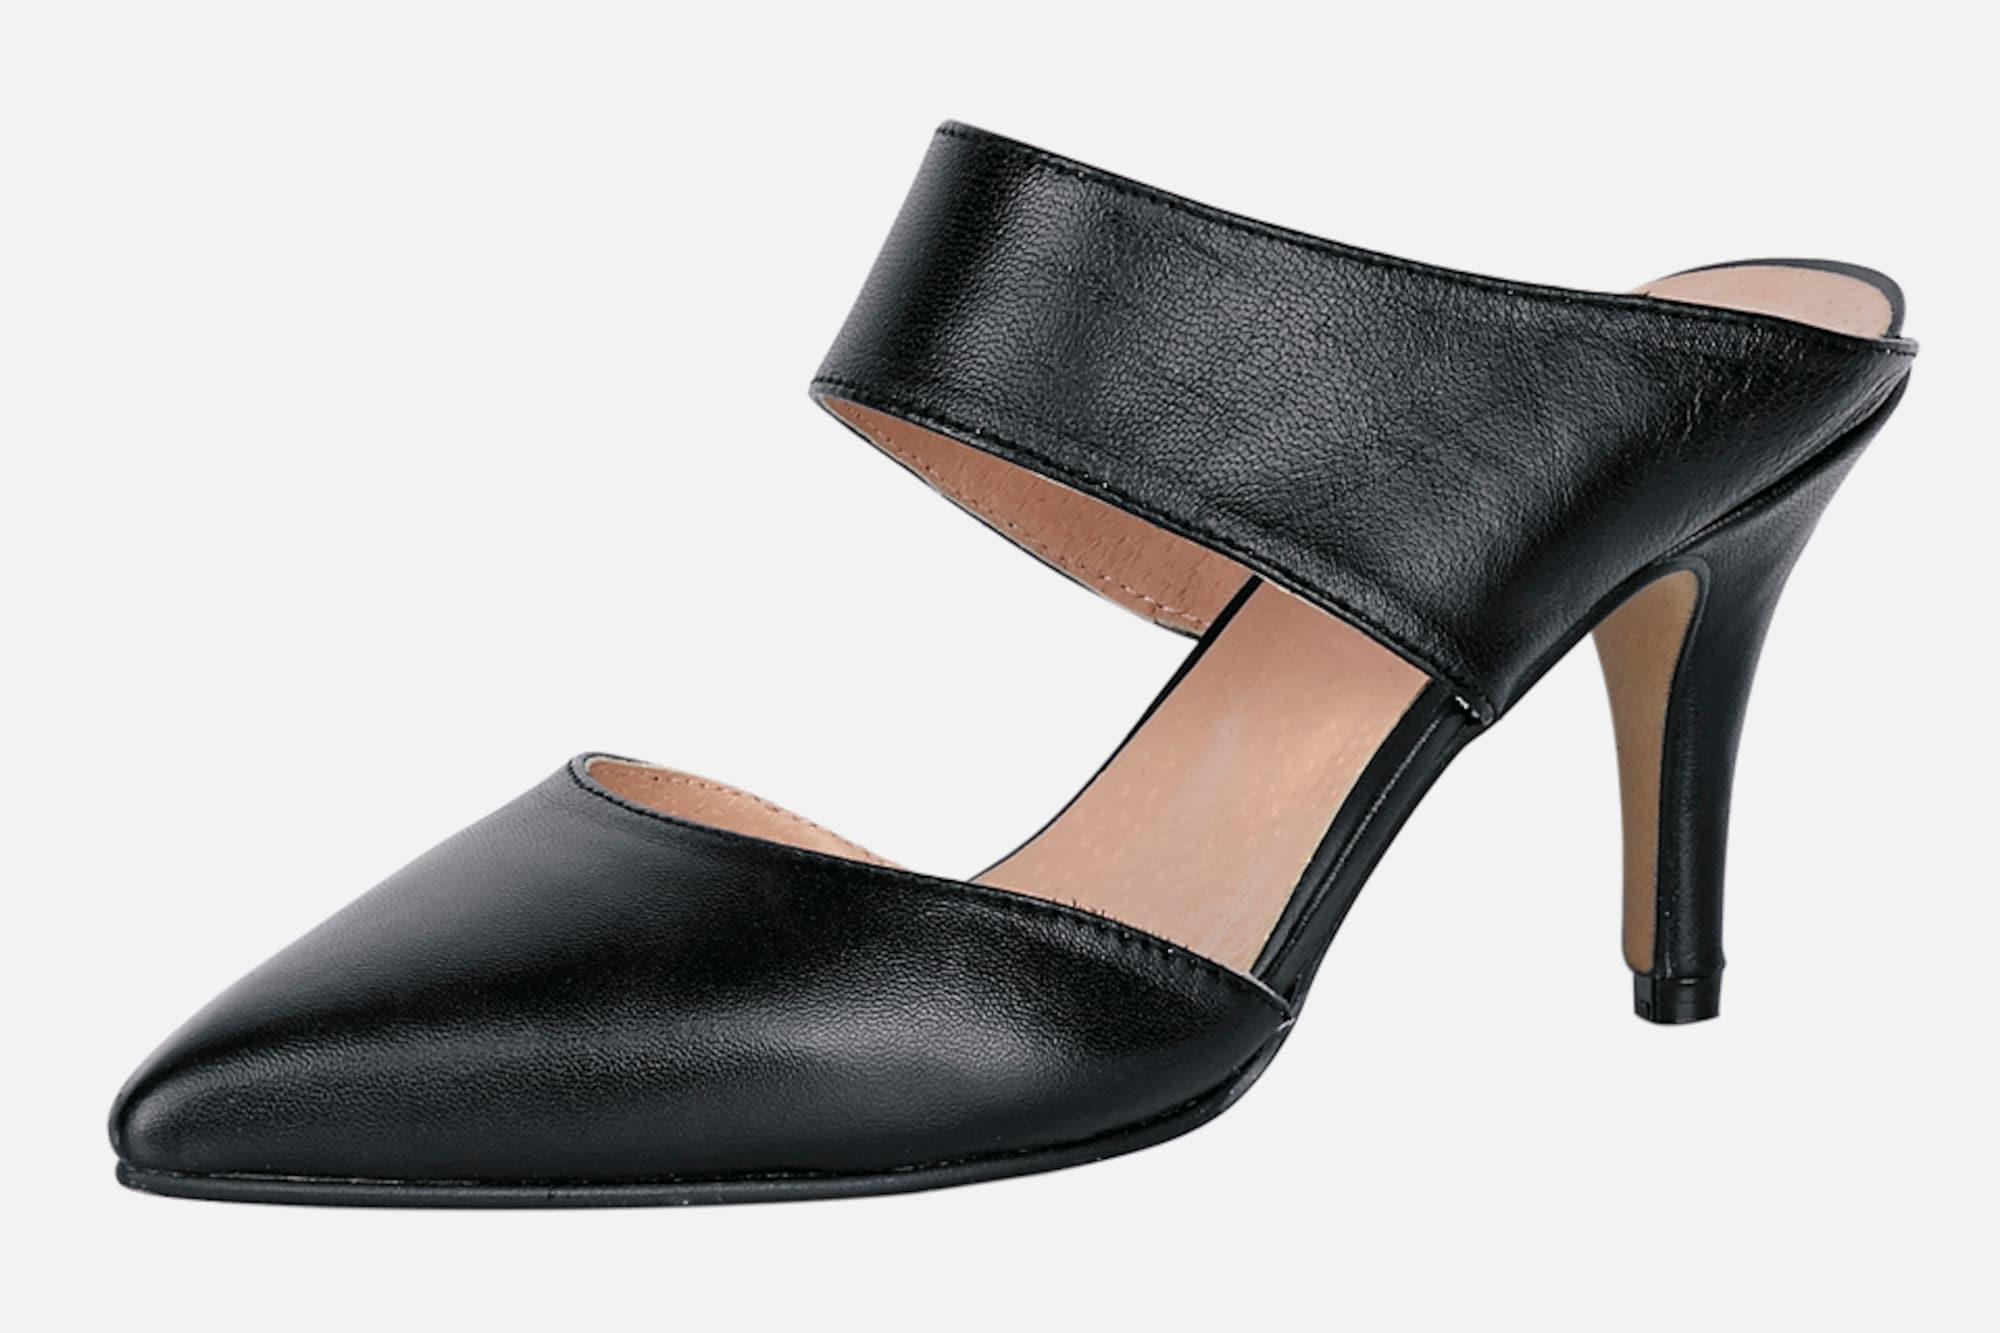 heine high heels 39 sabot 39 in schwarz about you. Black Bedroom Furniture Sets. Home Design Ideas